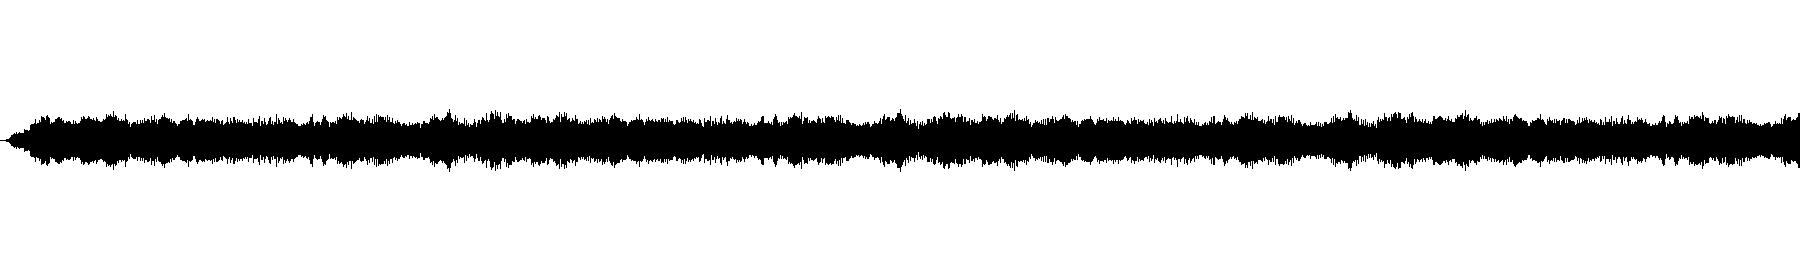 eerie choir chords   145bpm   ebmin